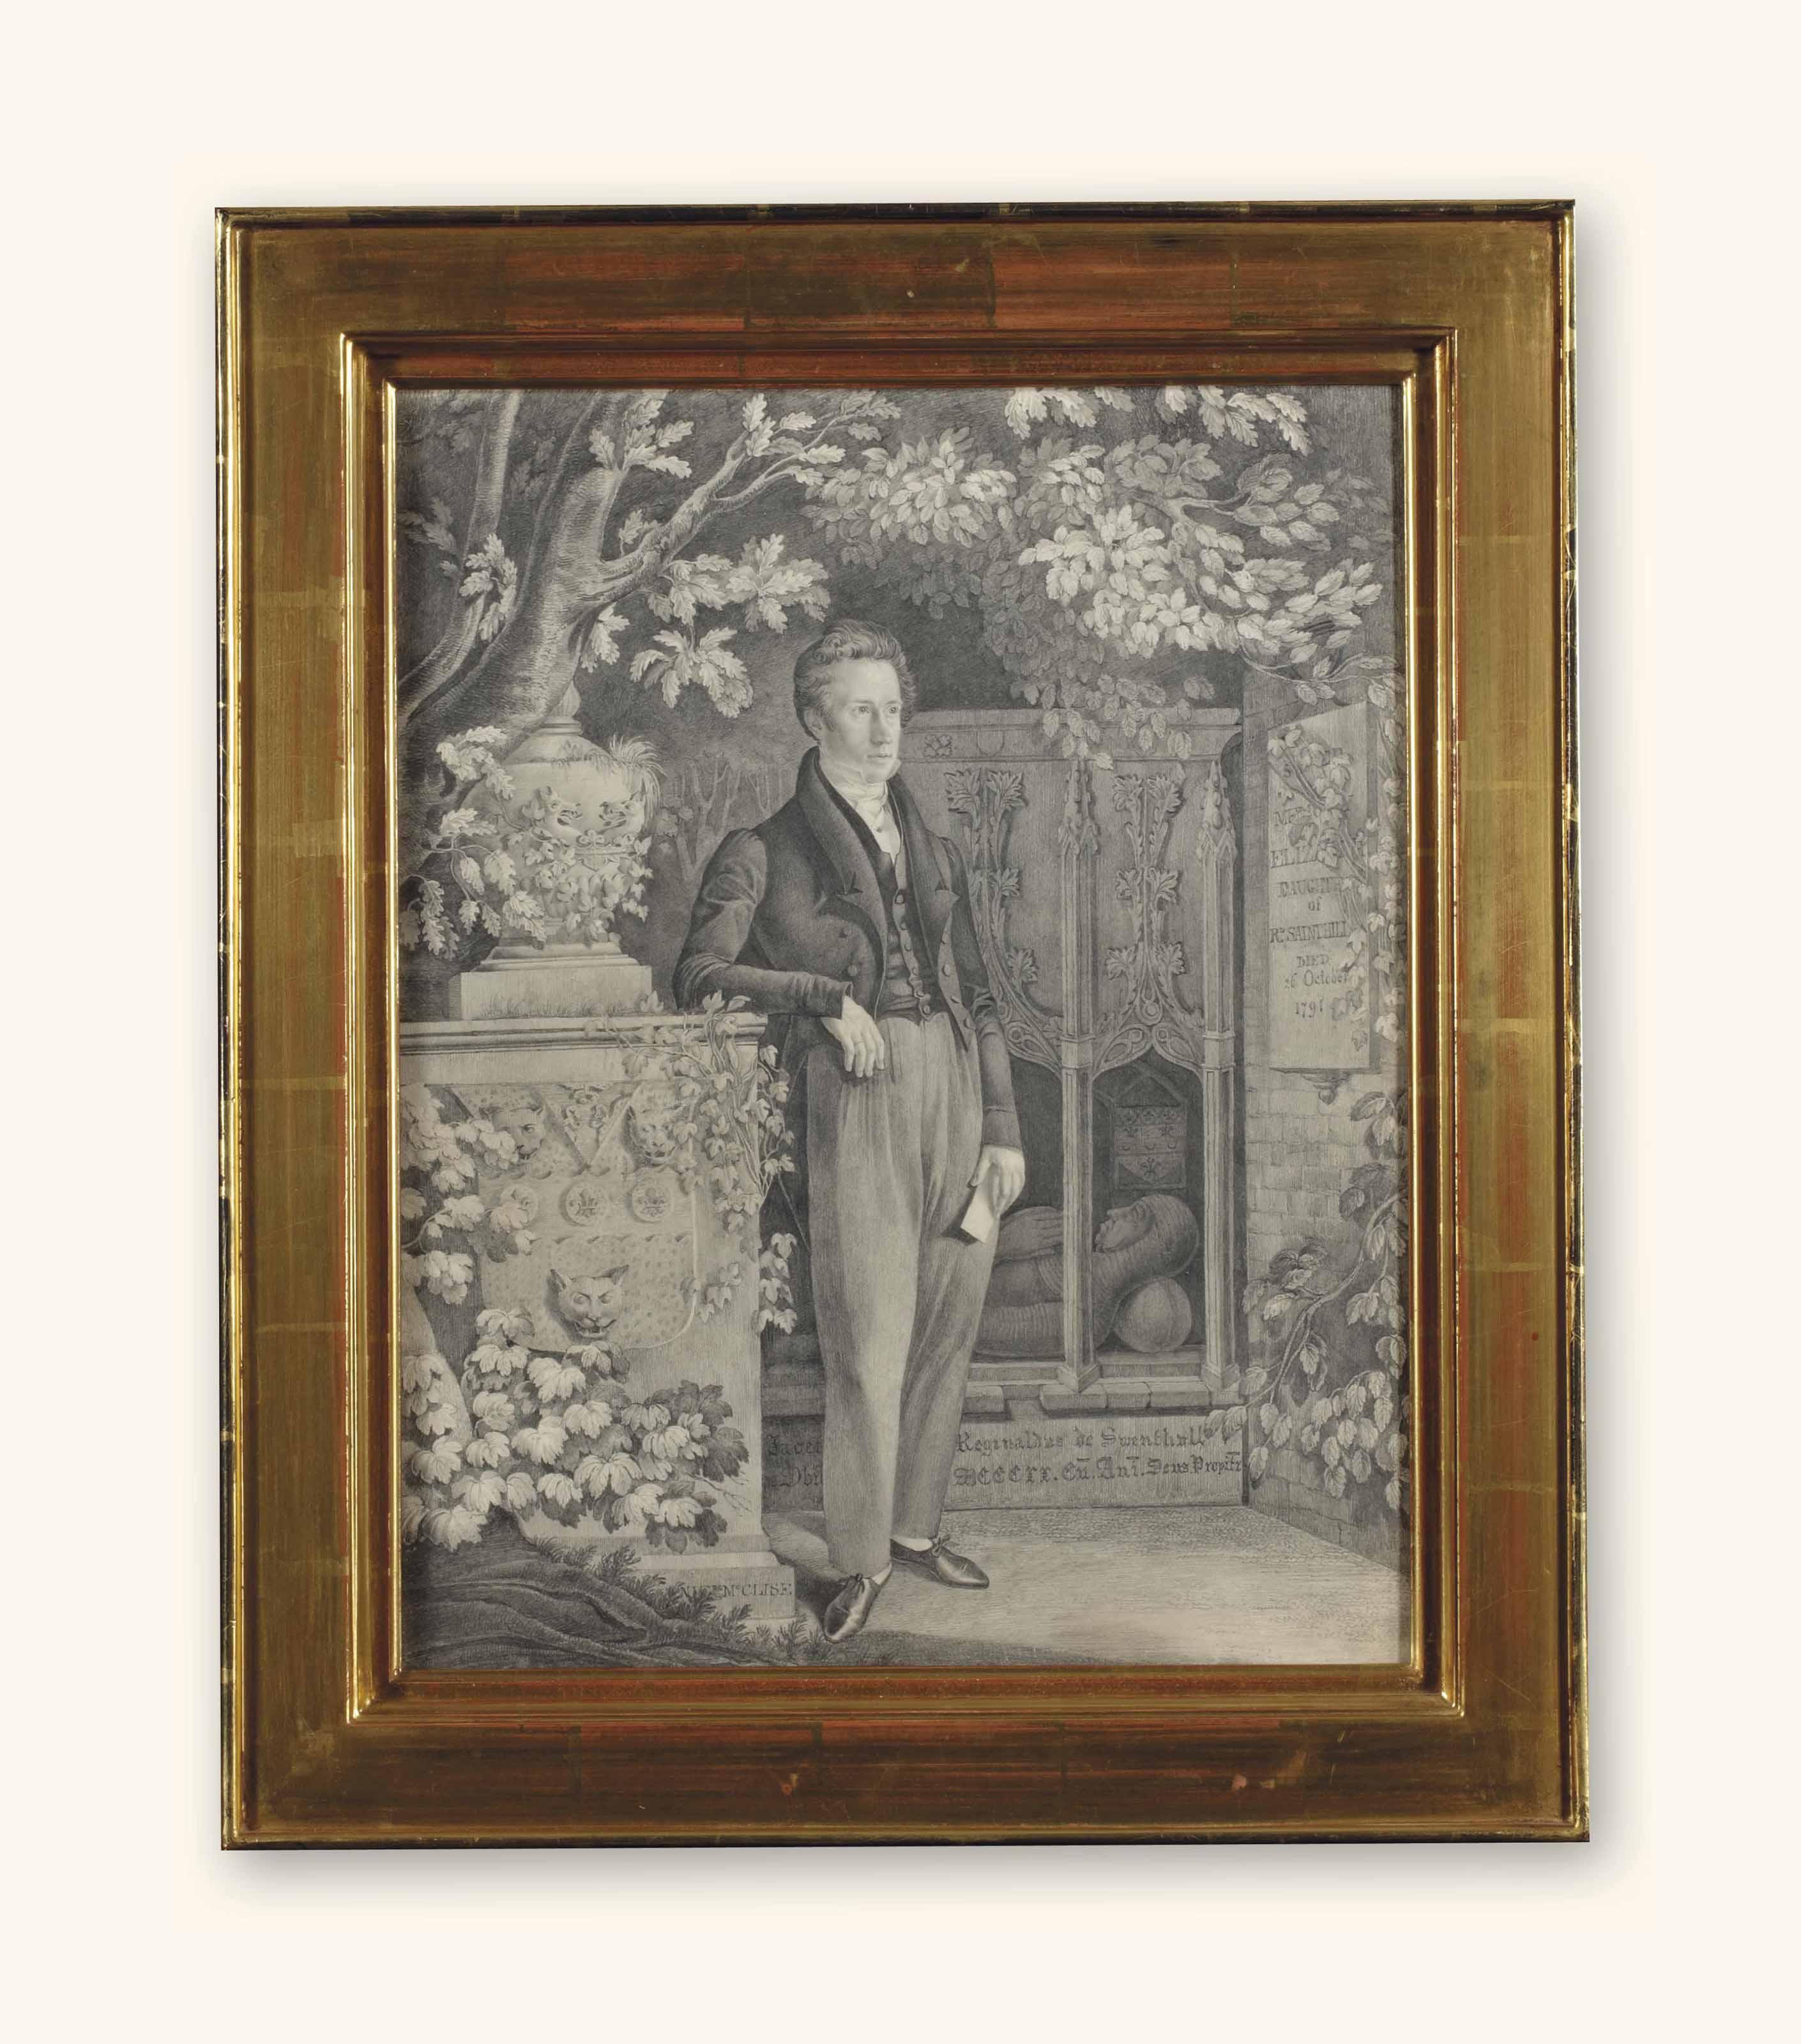 Richard Sandhill devant la tombe de Reginald de Swenthall